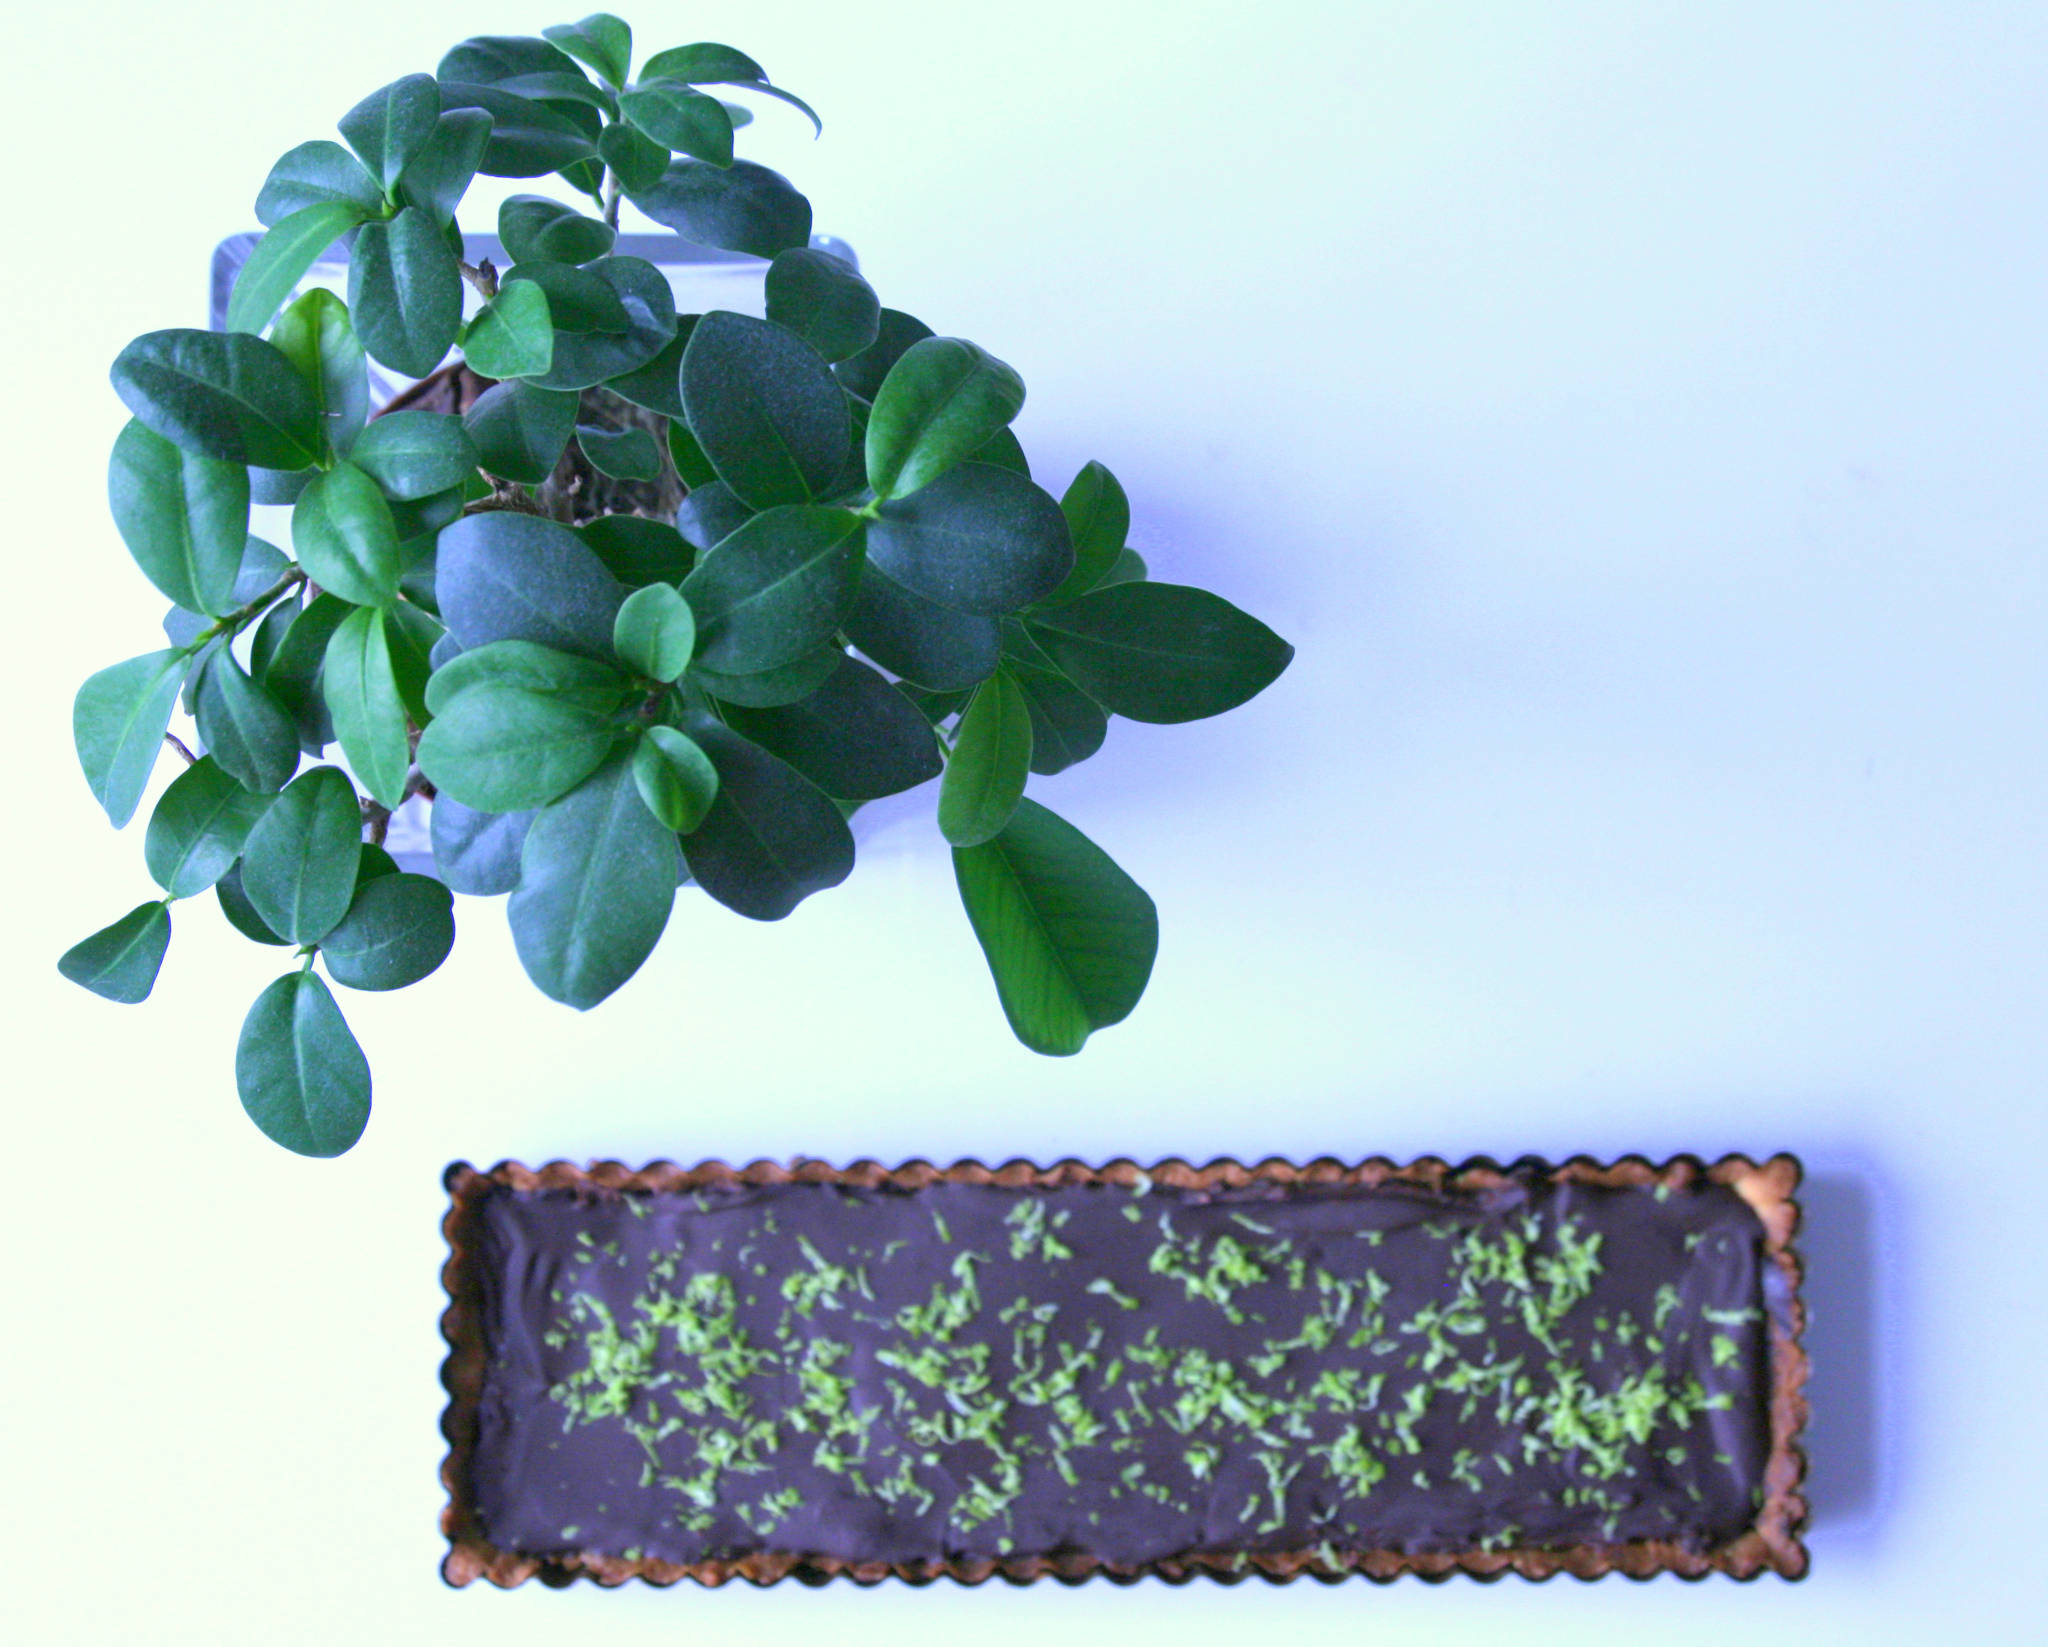 Tarte au chocolat et tonka, touche de citron vert